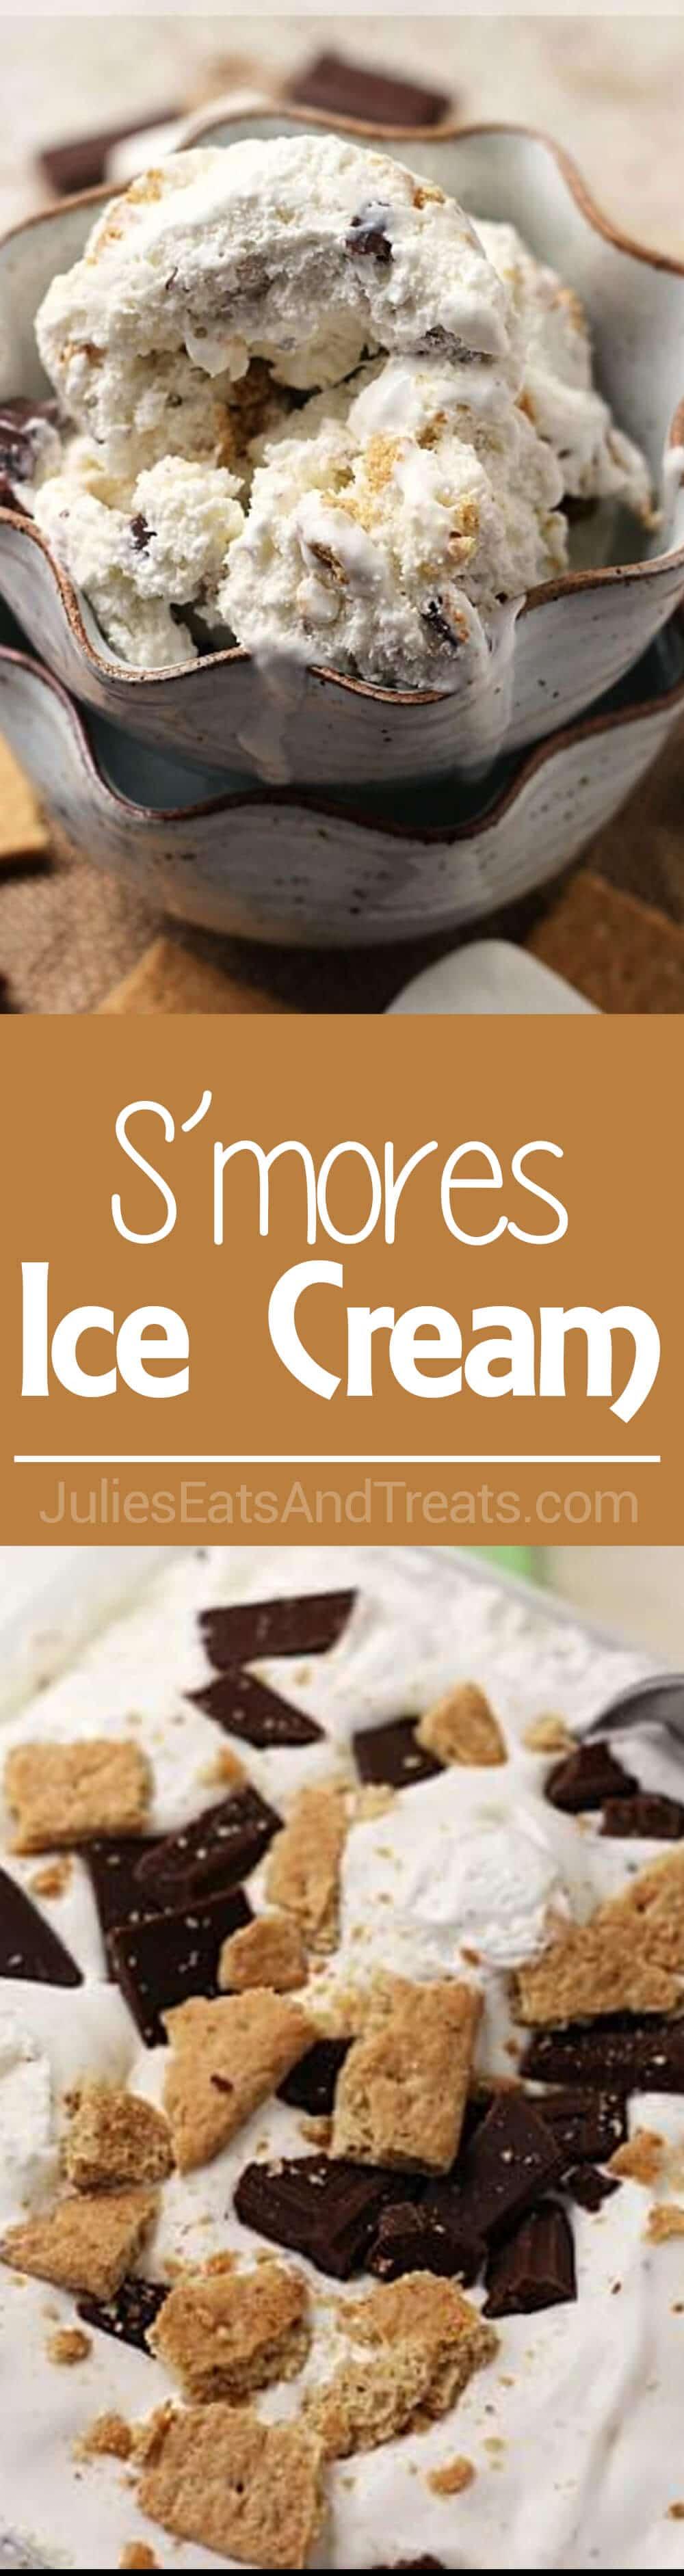 S'mores Ice Cream ~ Easy, Creamy Ice Cream Stuffed with Chocolate, Marshmallow & Graham Crackers!